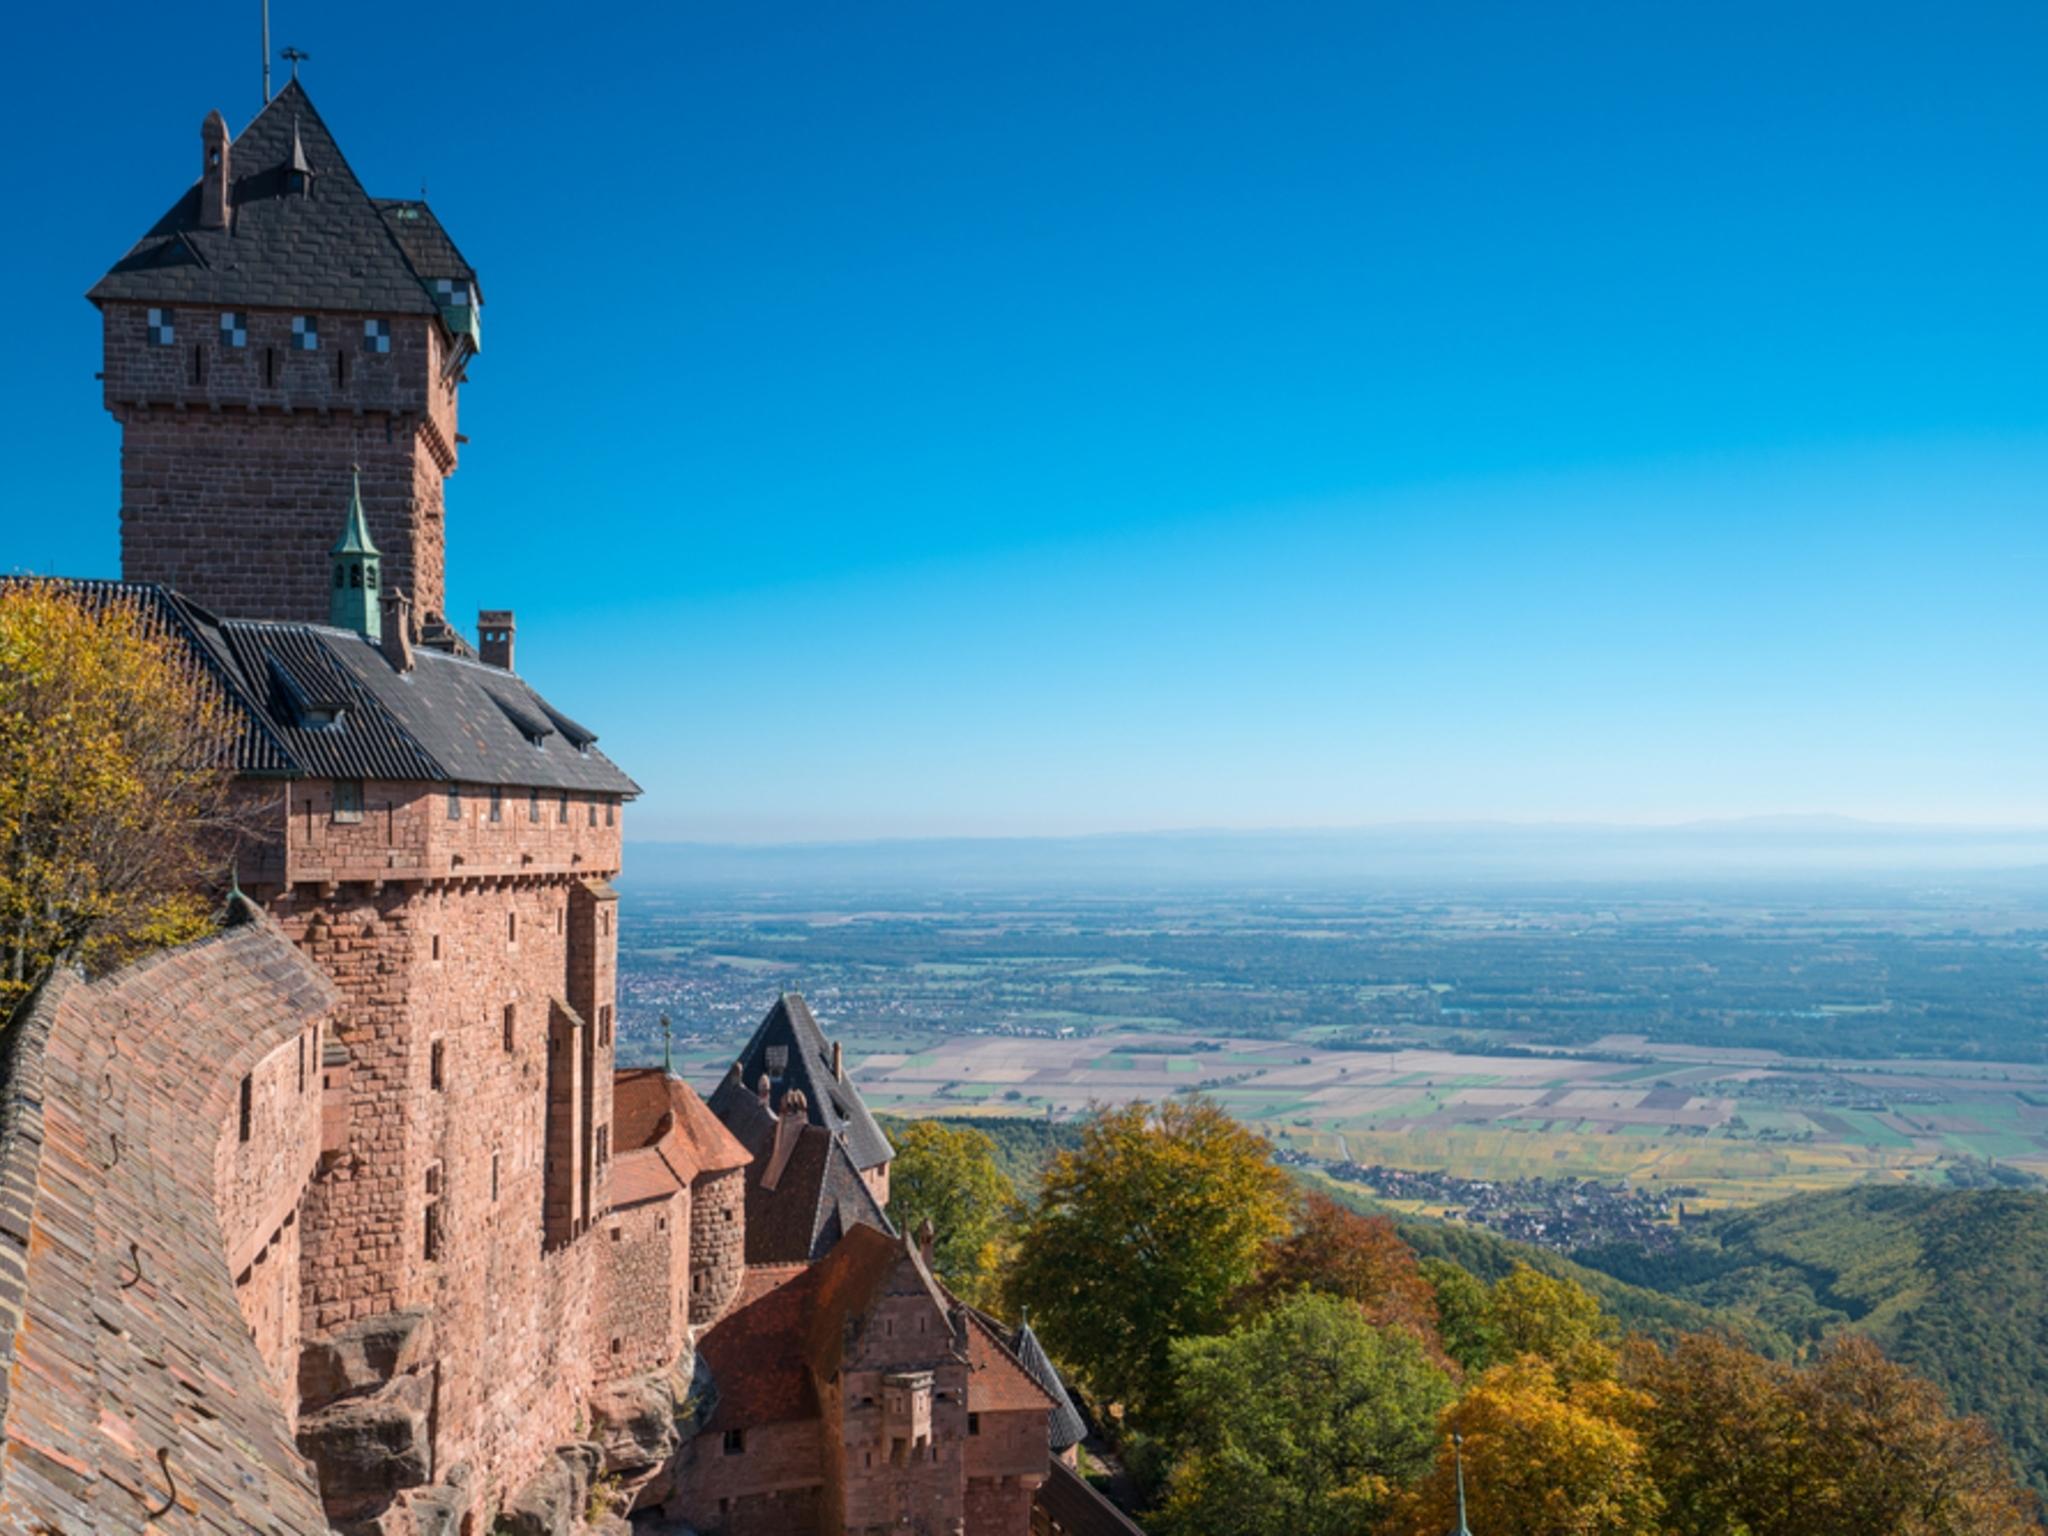 Château de Haut-Koenigsburg